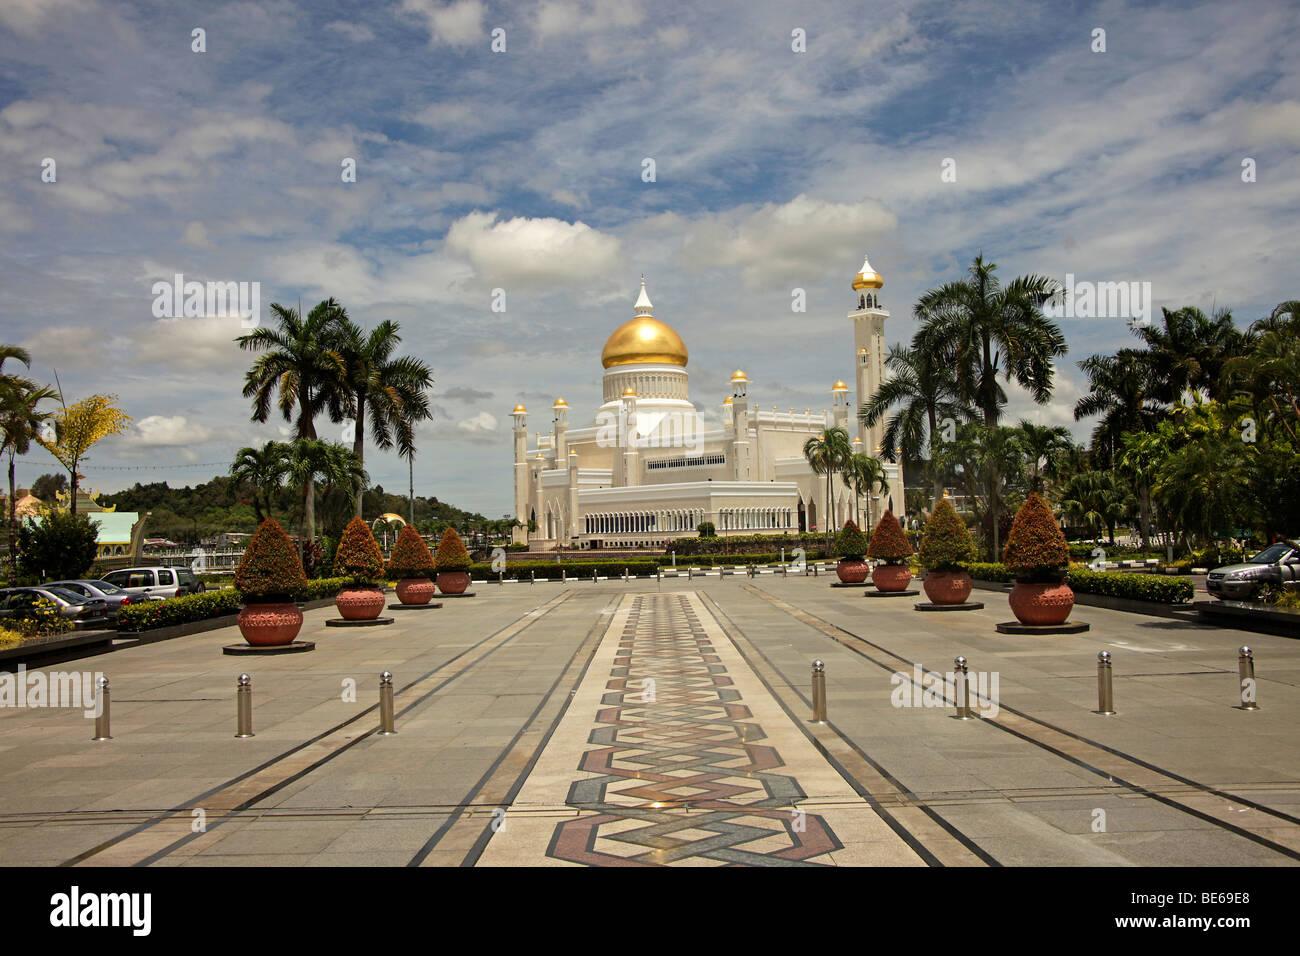 Royal Mosque of Sultan Omar Ali Saifuddin in the capital city, Bandar Seri Begawan, Brunei, Asia - Stock Image